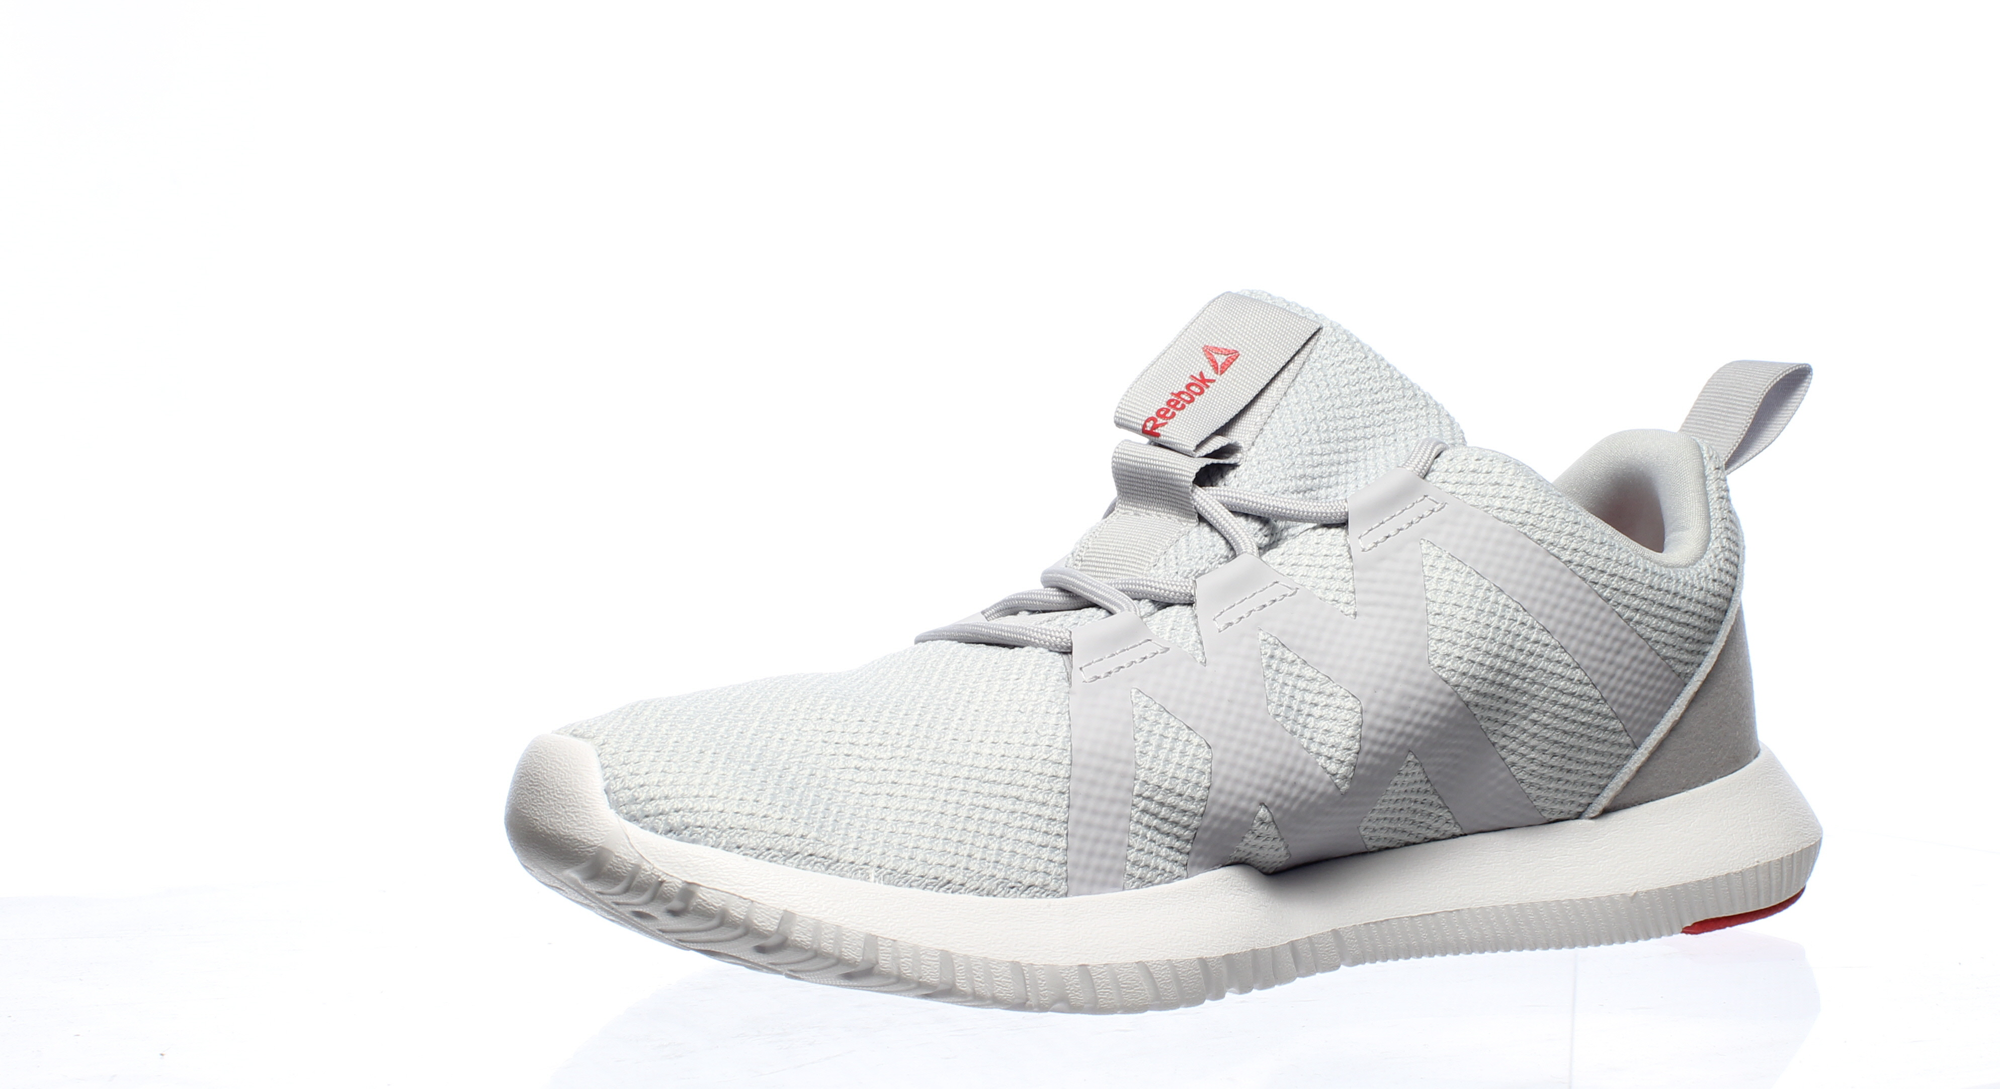 Reebok-Mens-Athletic-Reago-Pulse-Cross-Training-Shoes miniature 14